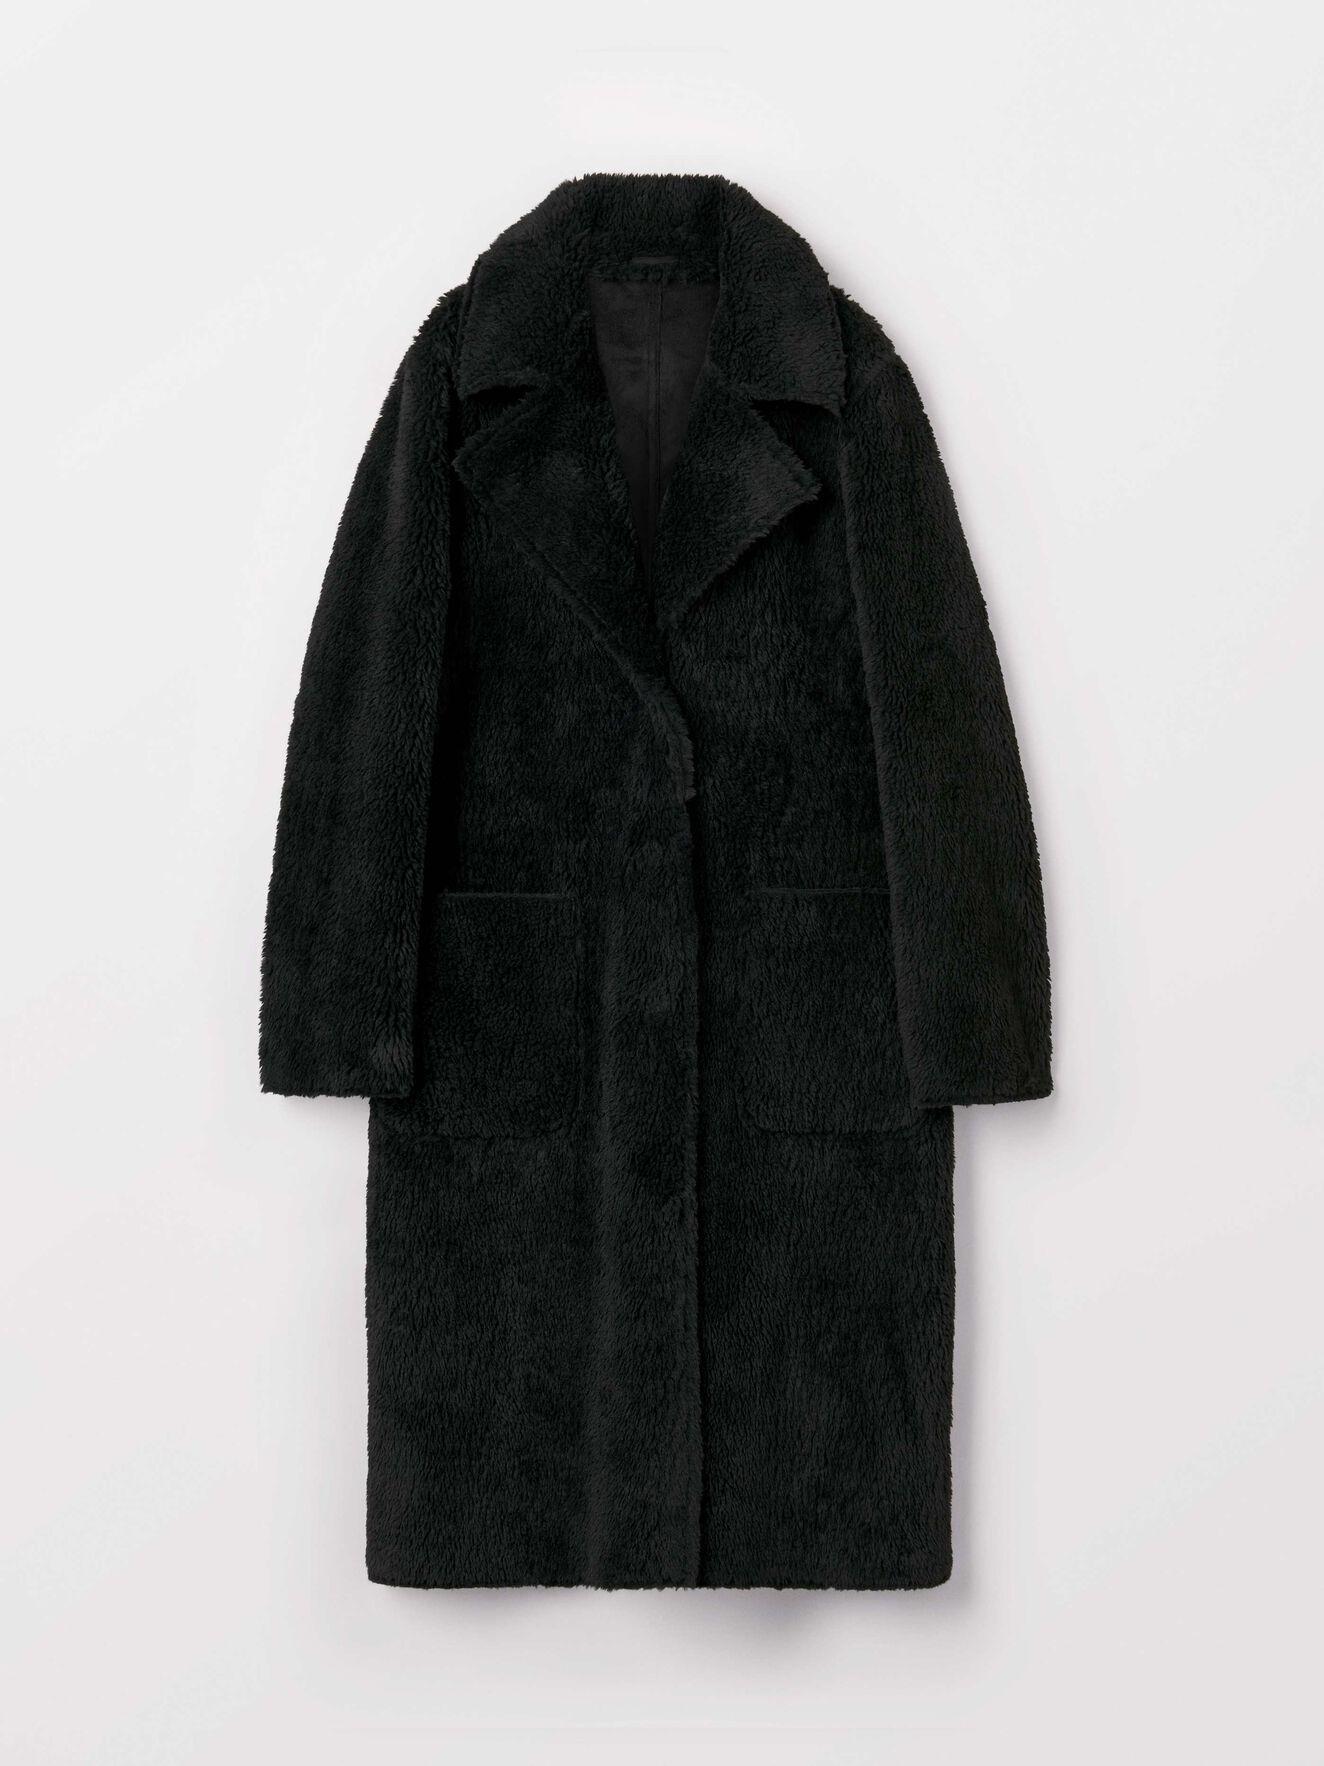 Zinnia Coat in Black from Tiger of Sweden